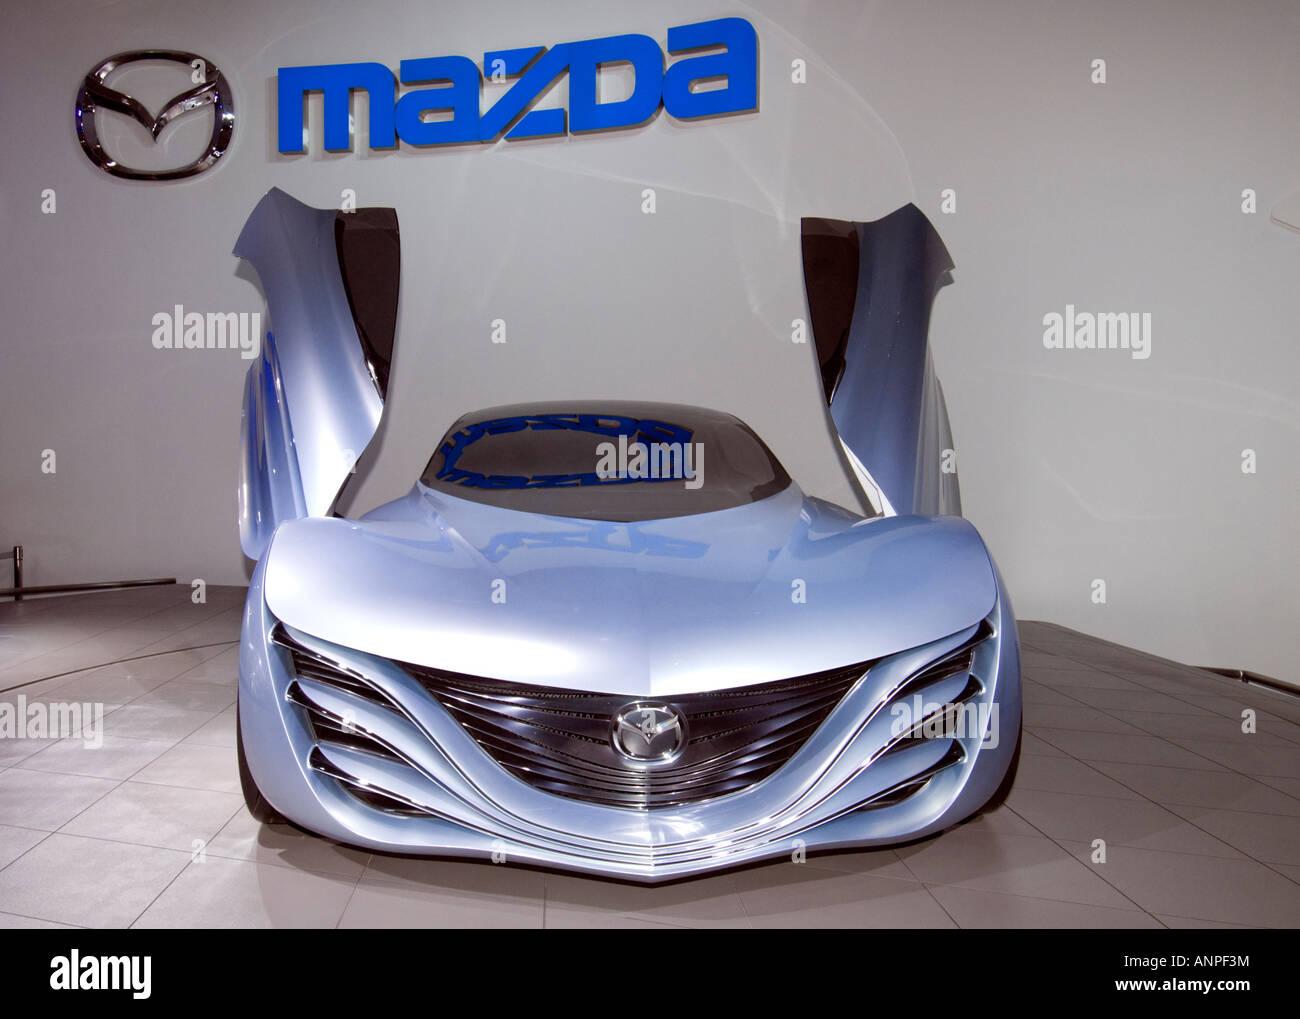 https://c8.alamy.com/comp/ANPF3M/futuristic-mazda-taiki-concept-sports-car-at-tokyo-motor-show-2007-ANPF3M.jpg